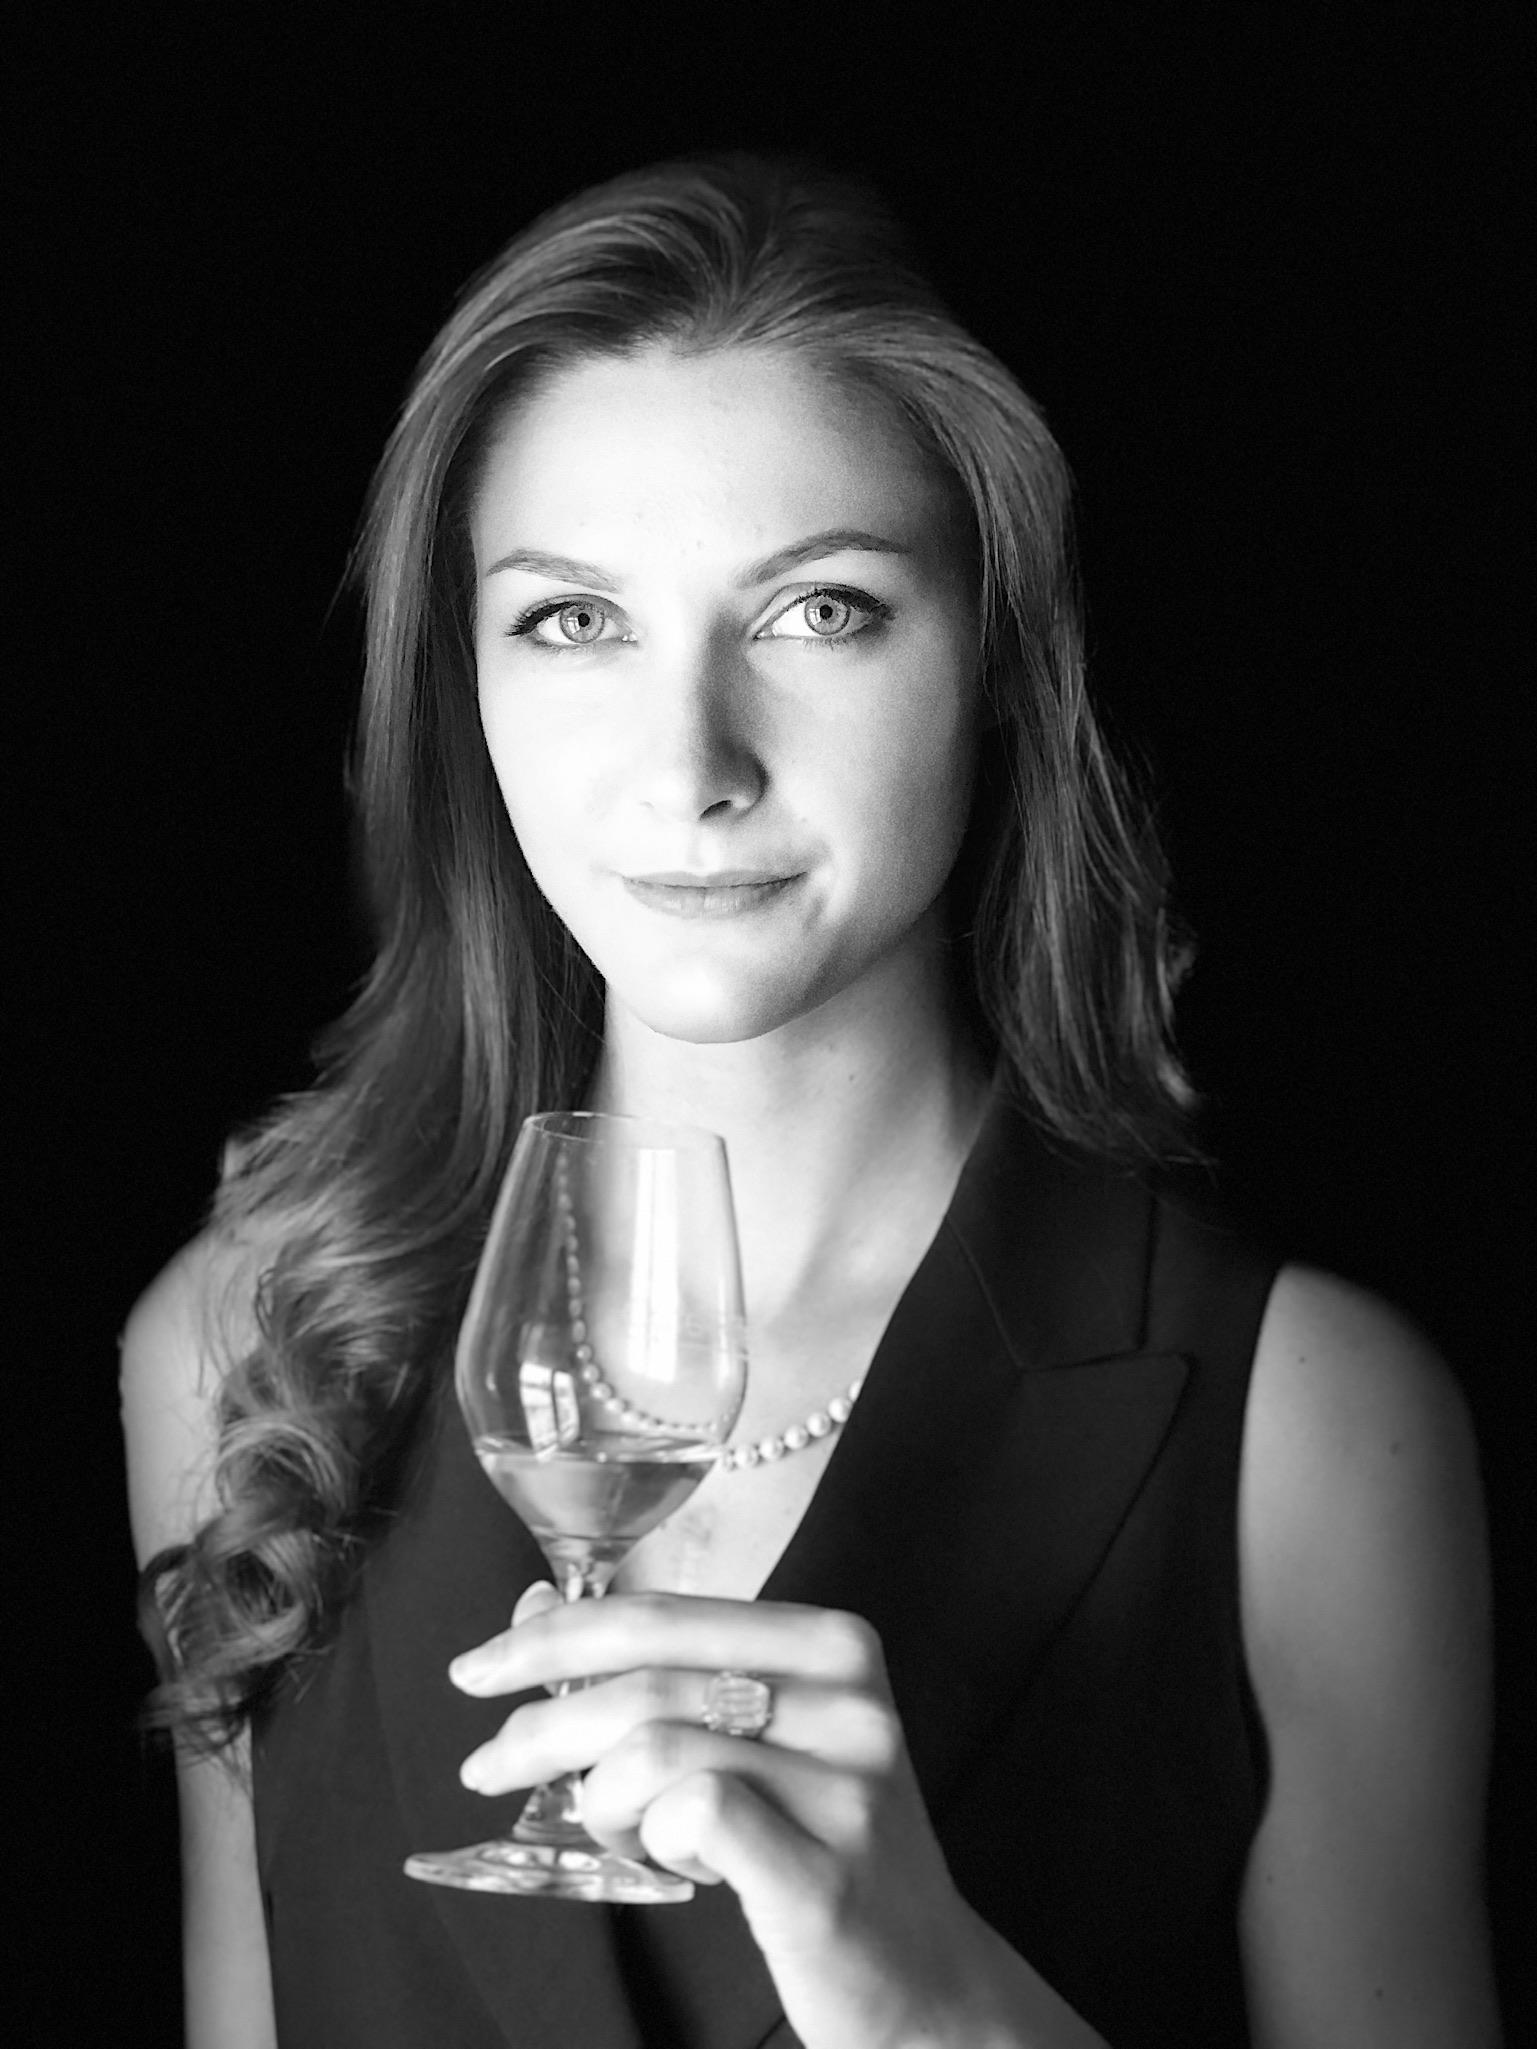 Raine - The Wine Painter